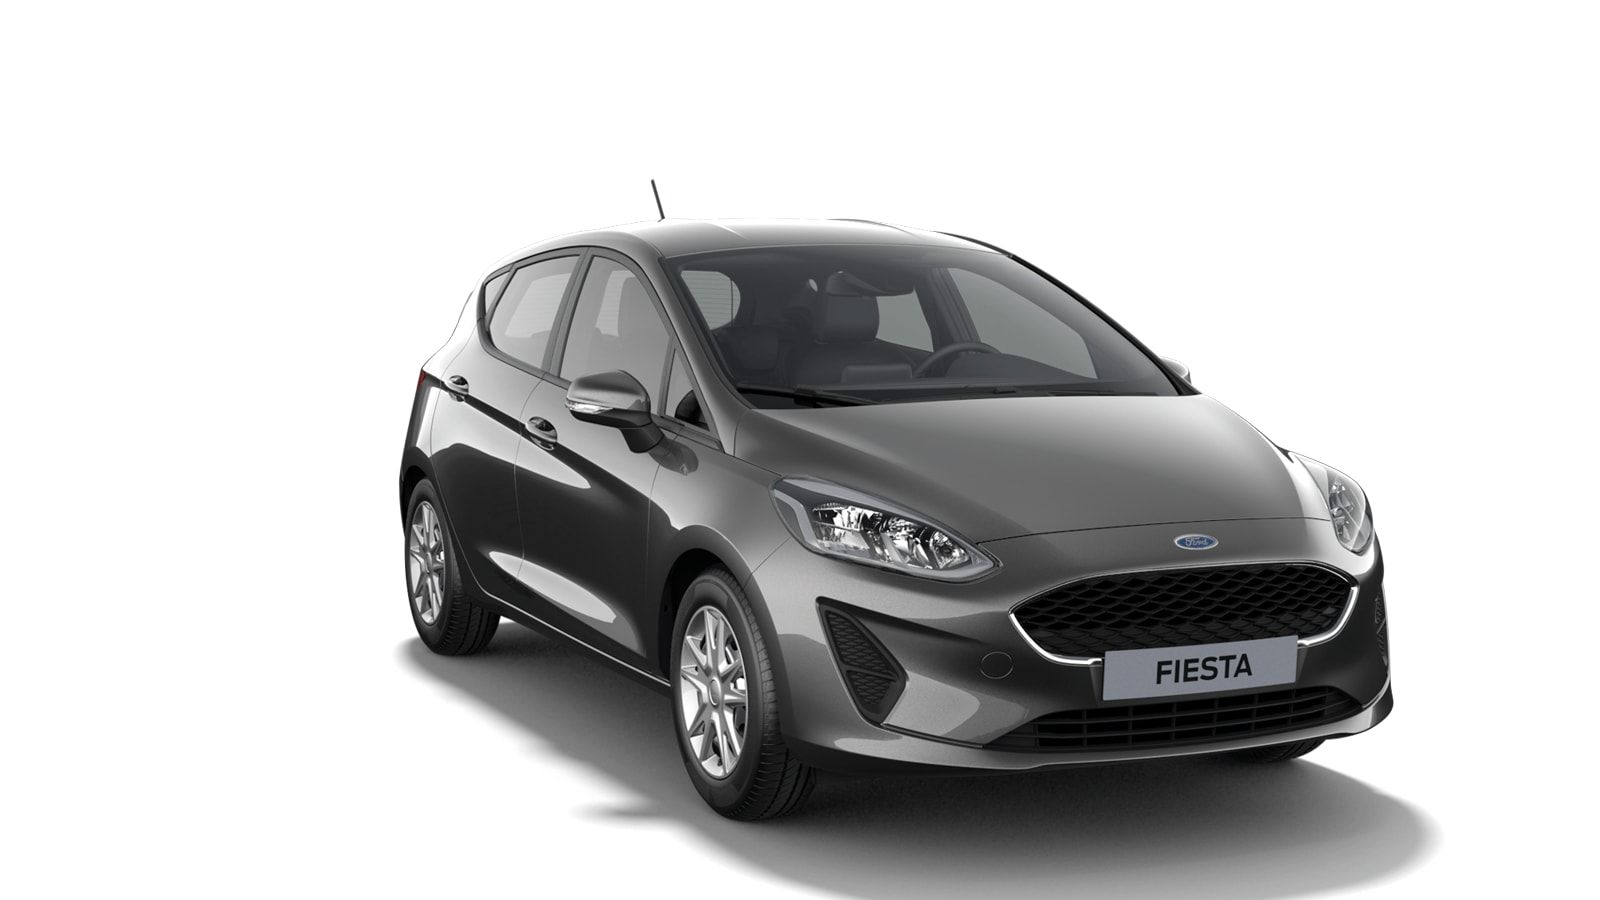 Nieuw Ford Fiesta van b479 Trend 1.1 Ti-VCT 75pk/ch (63KW) M5 Euro 6d A5B - Magnetic 4